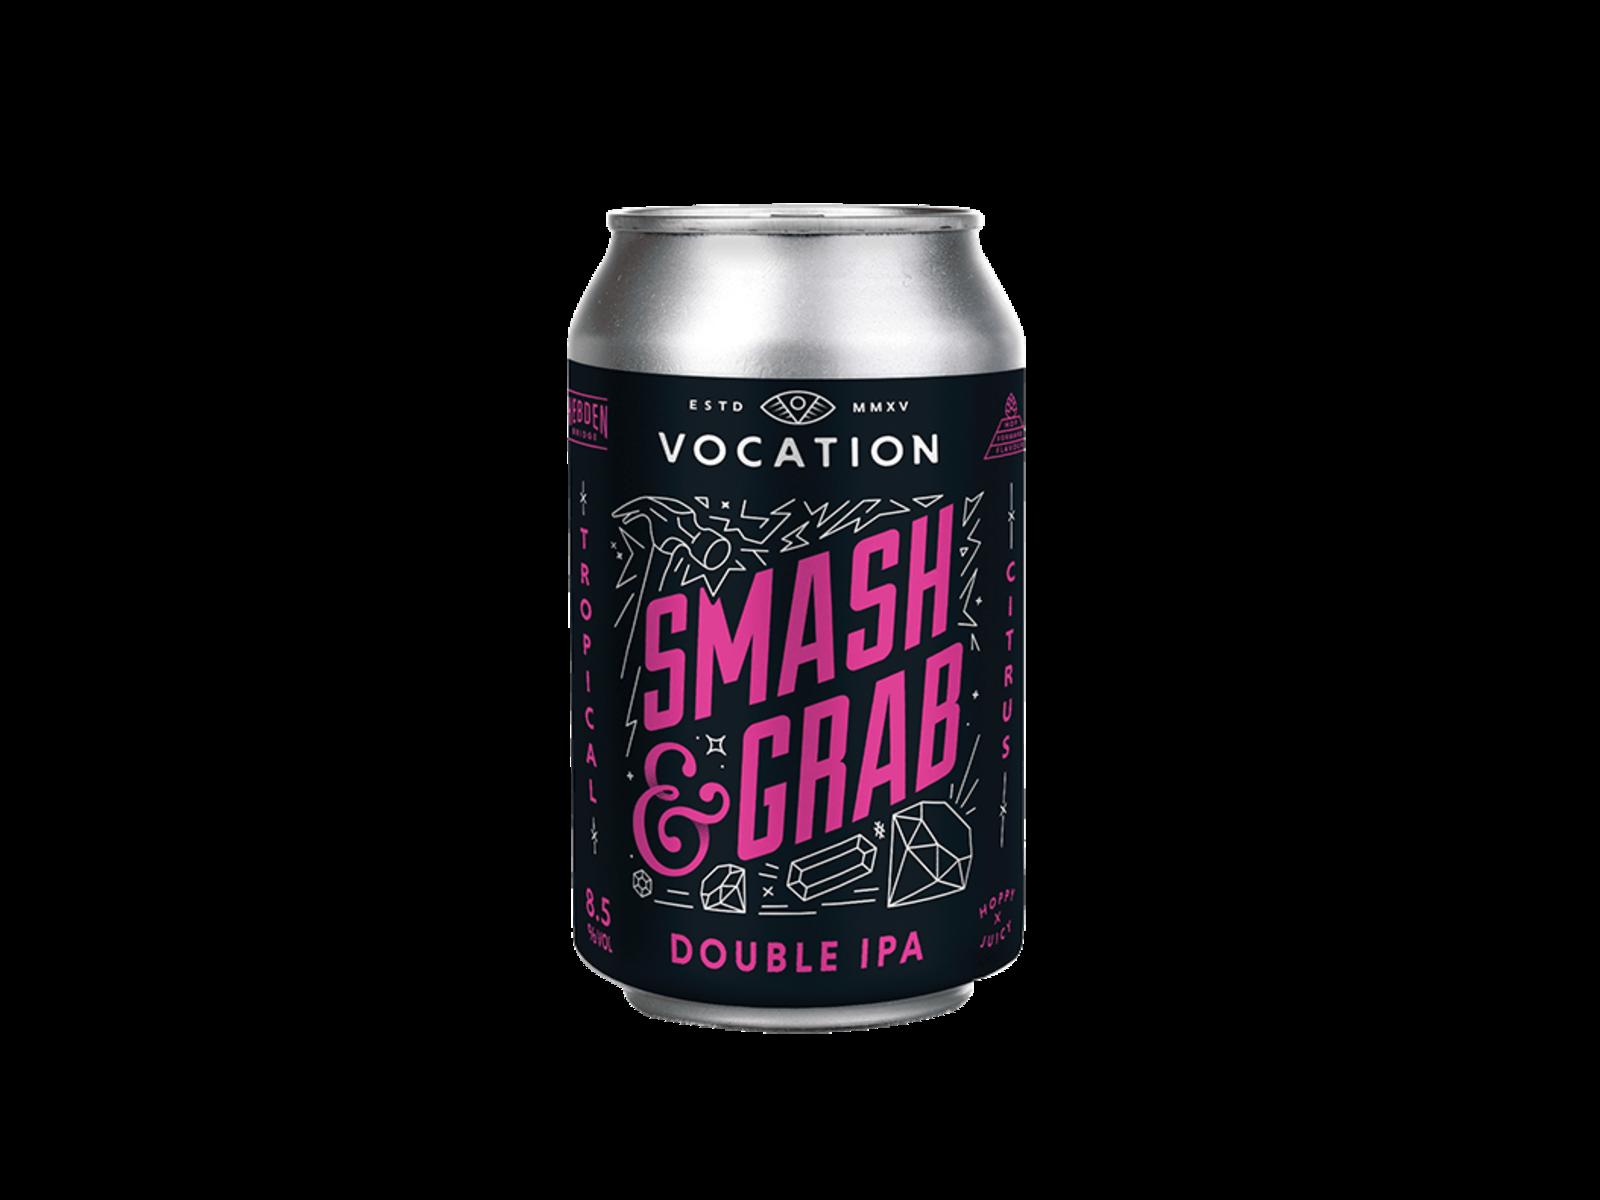 Vocation Smash & Grab - DIPA